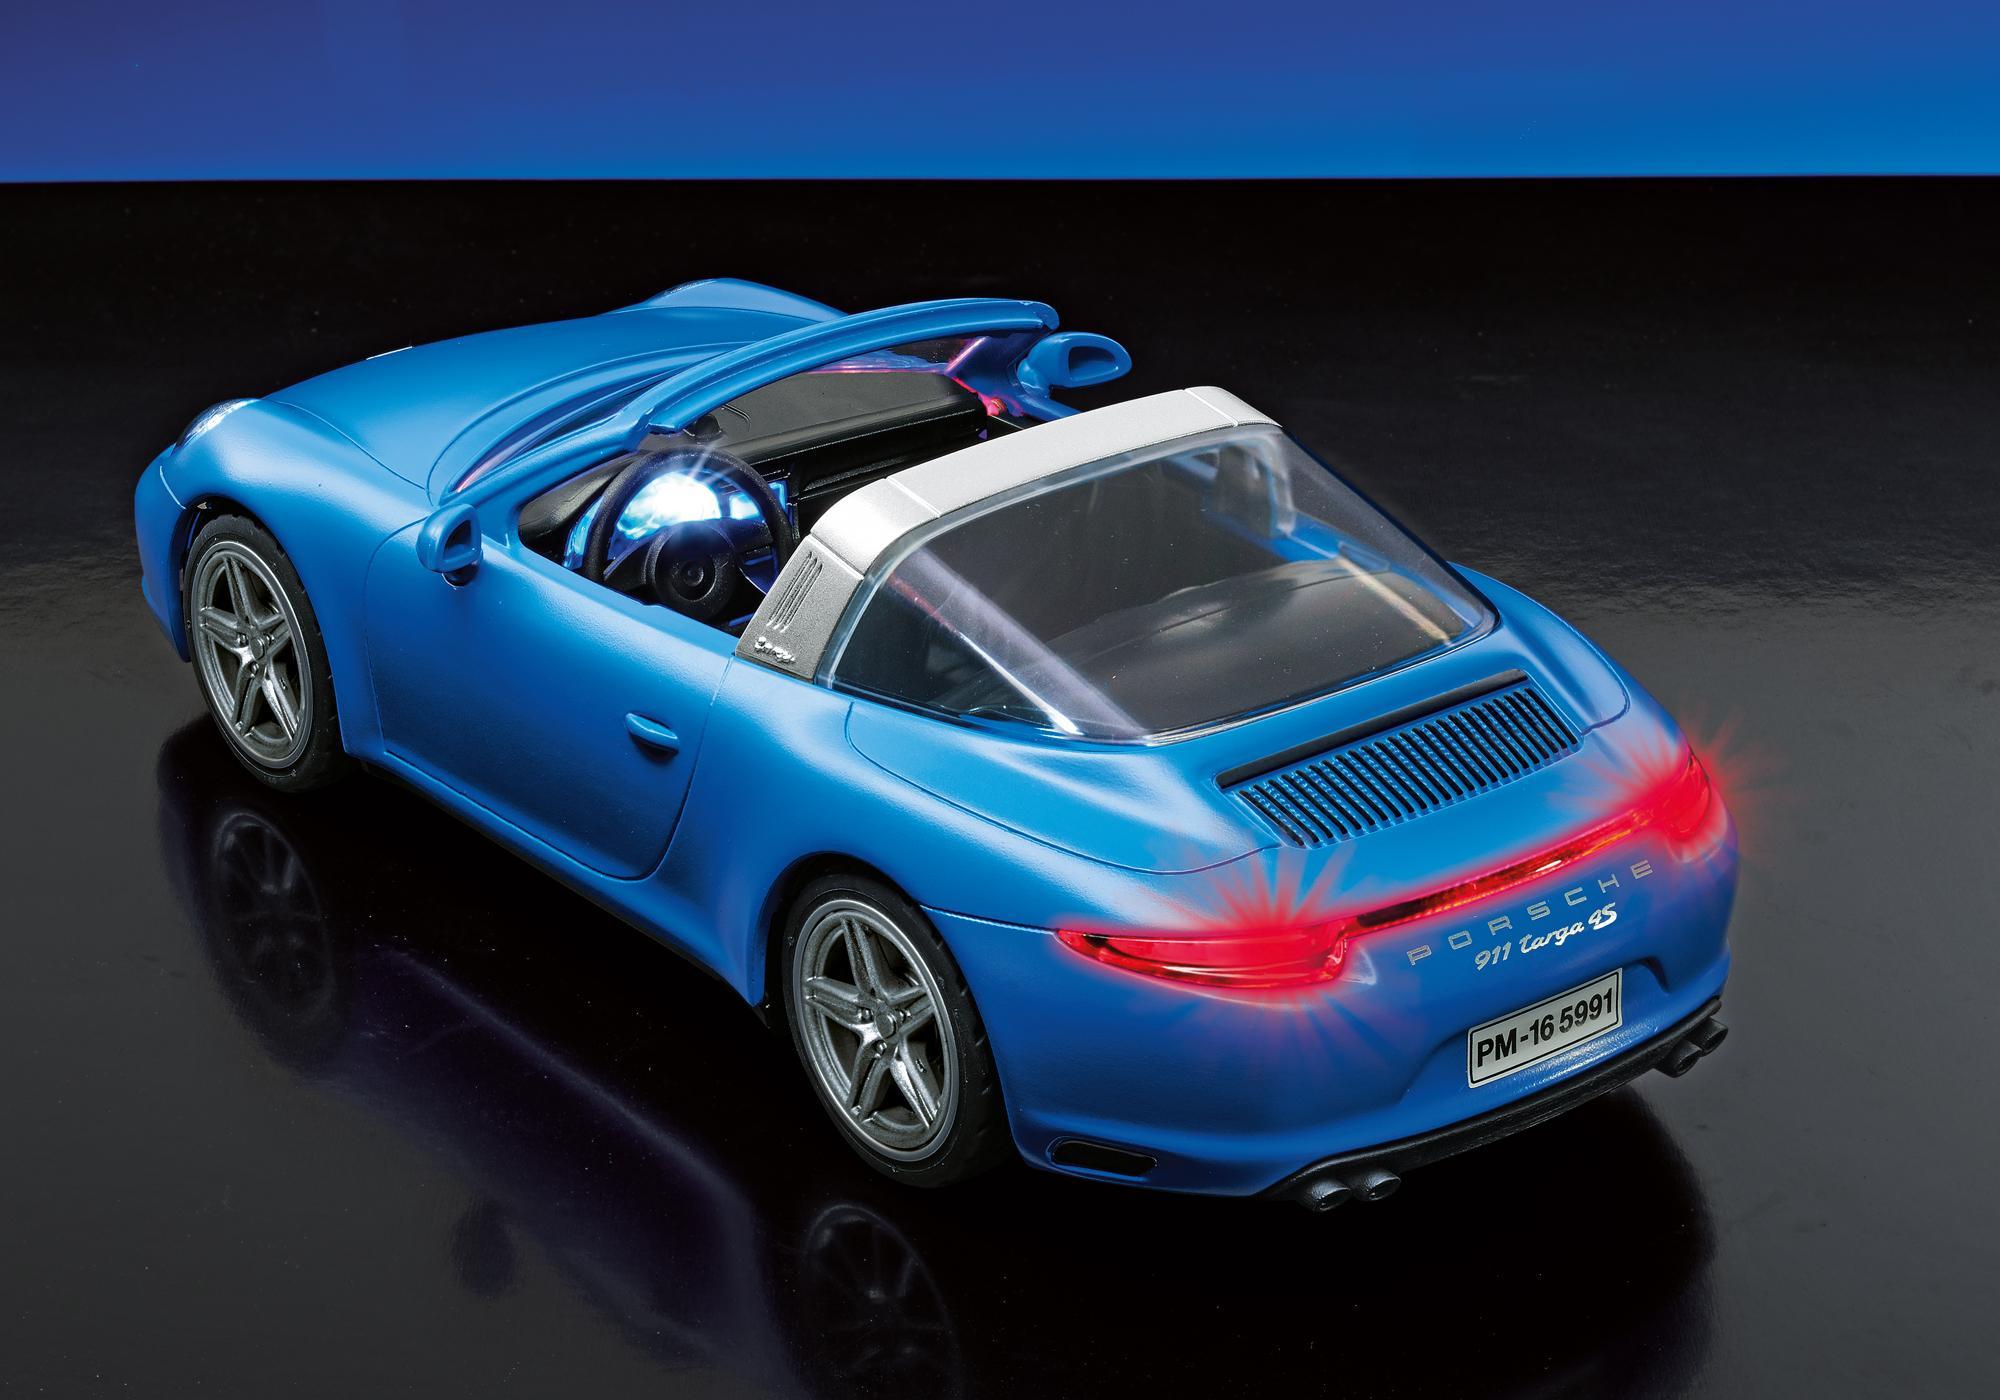 http://media.playmobil.com/i/playmobil/5991_product_extra1/ Porsche 911 Targa 4S